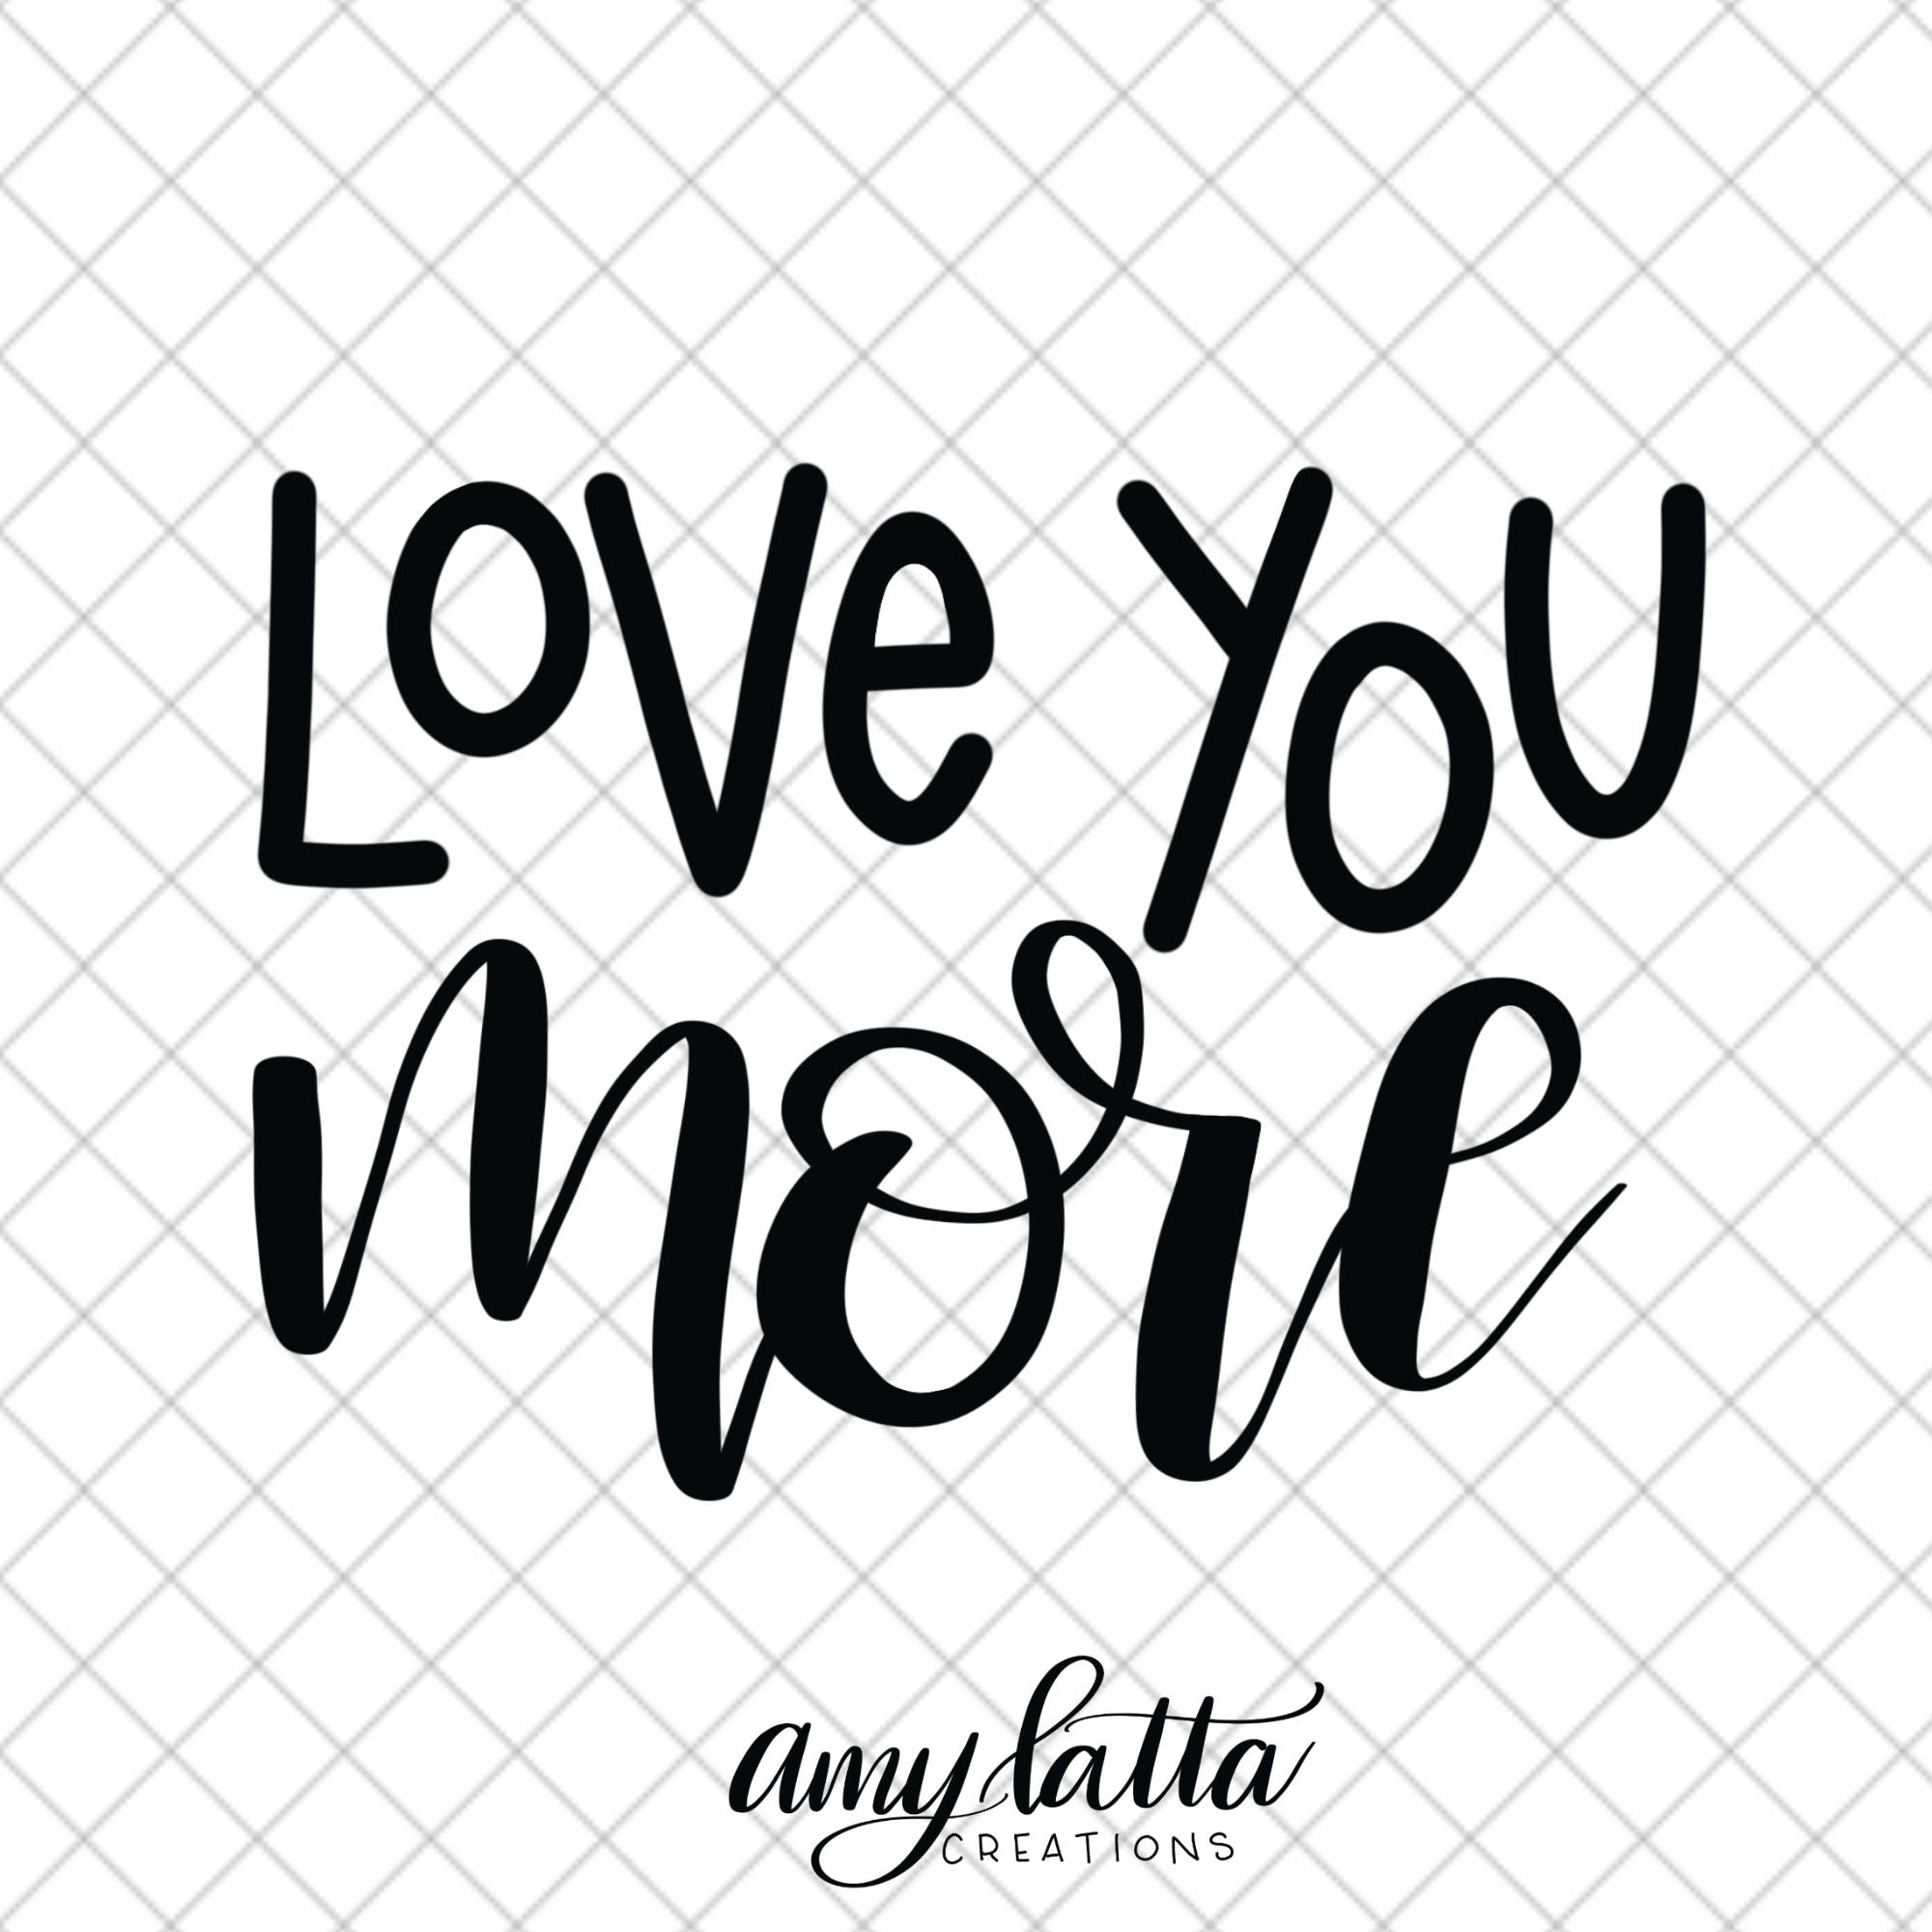 Free Cut File: Love You More